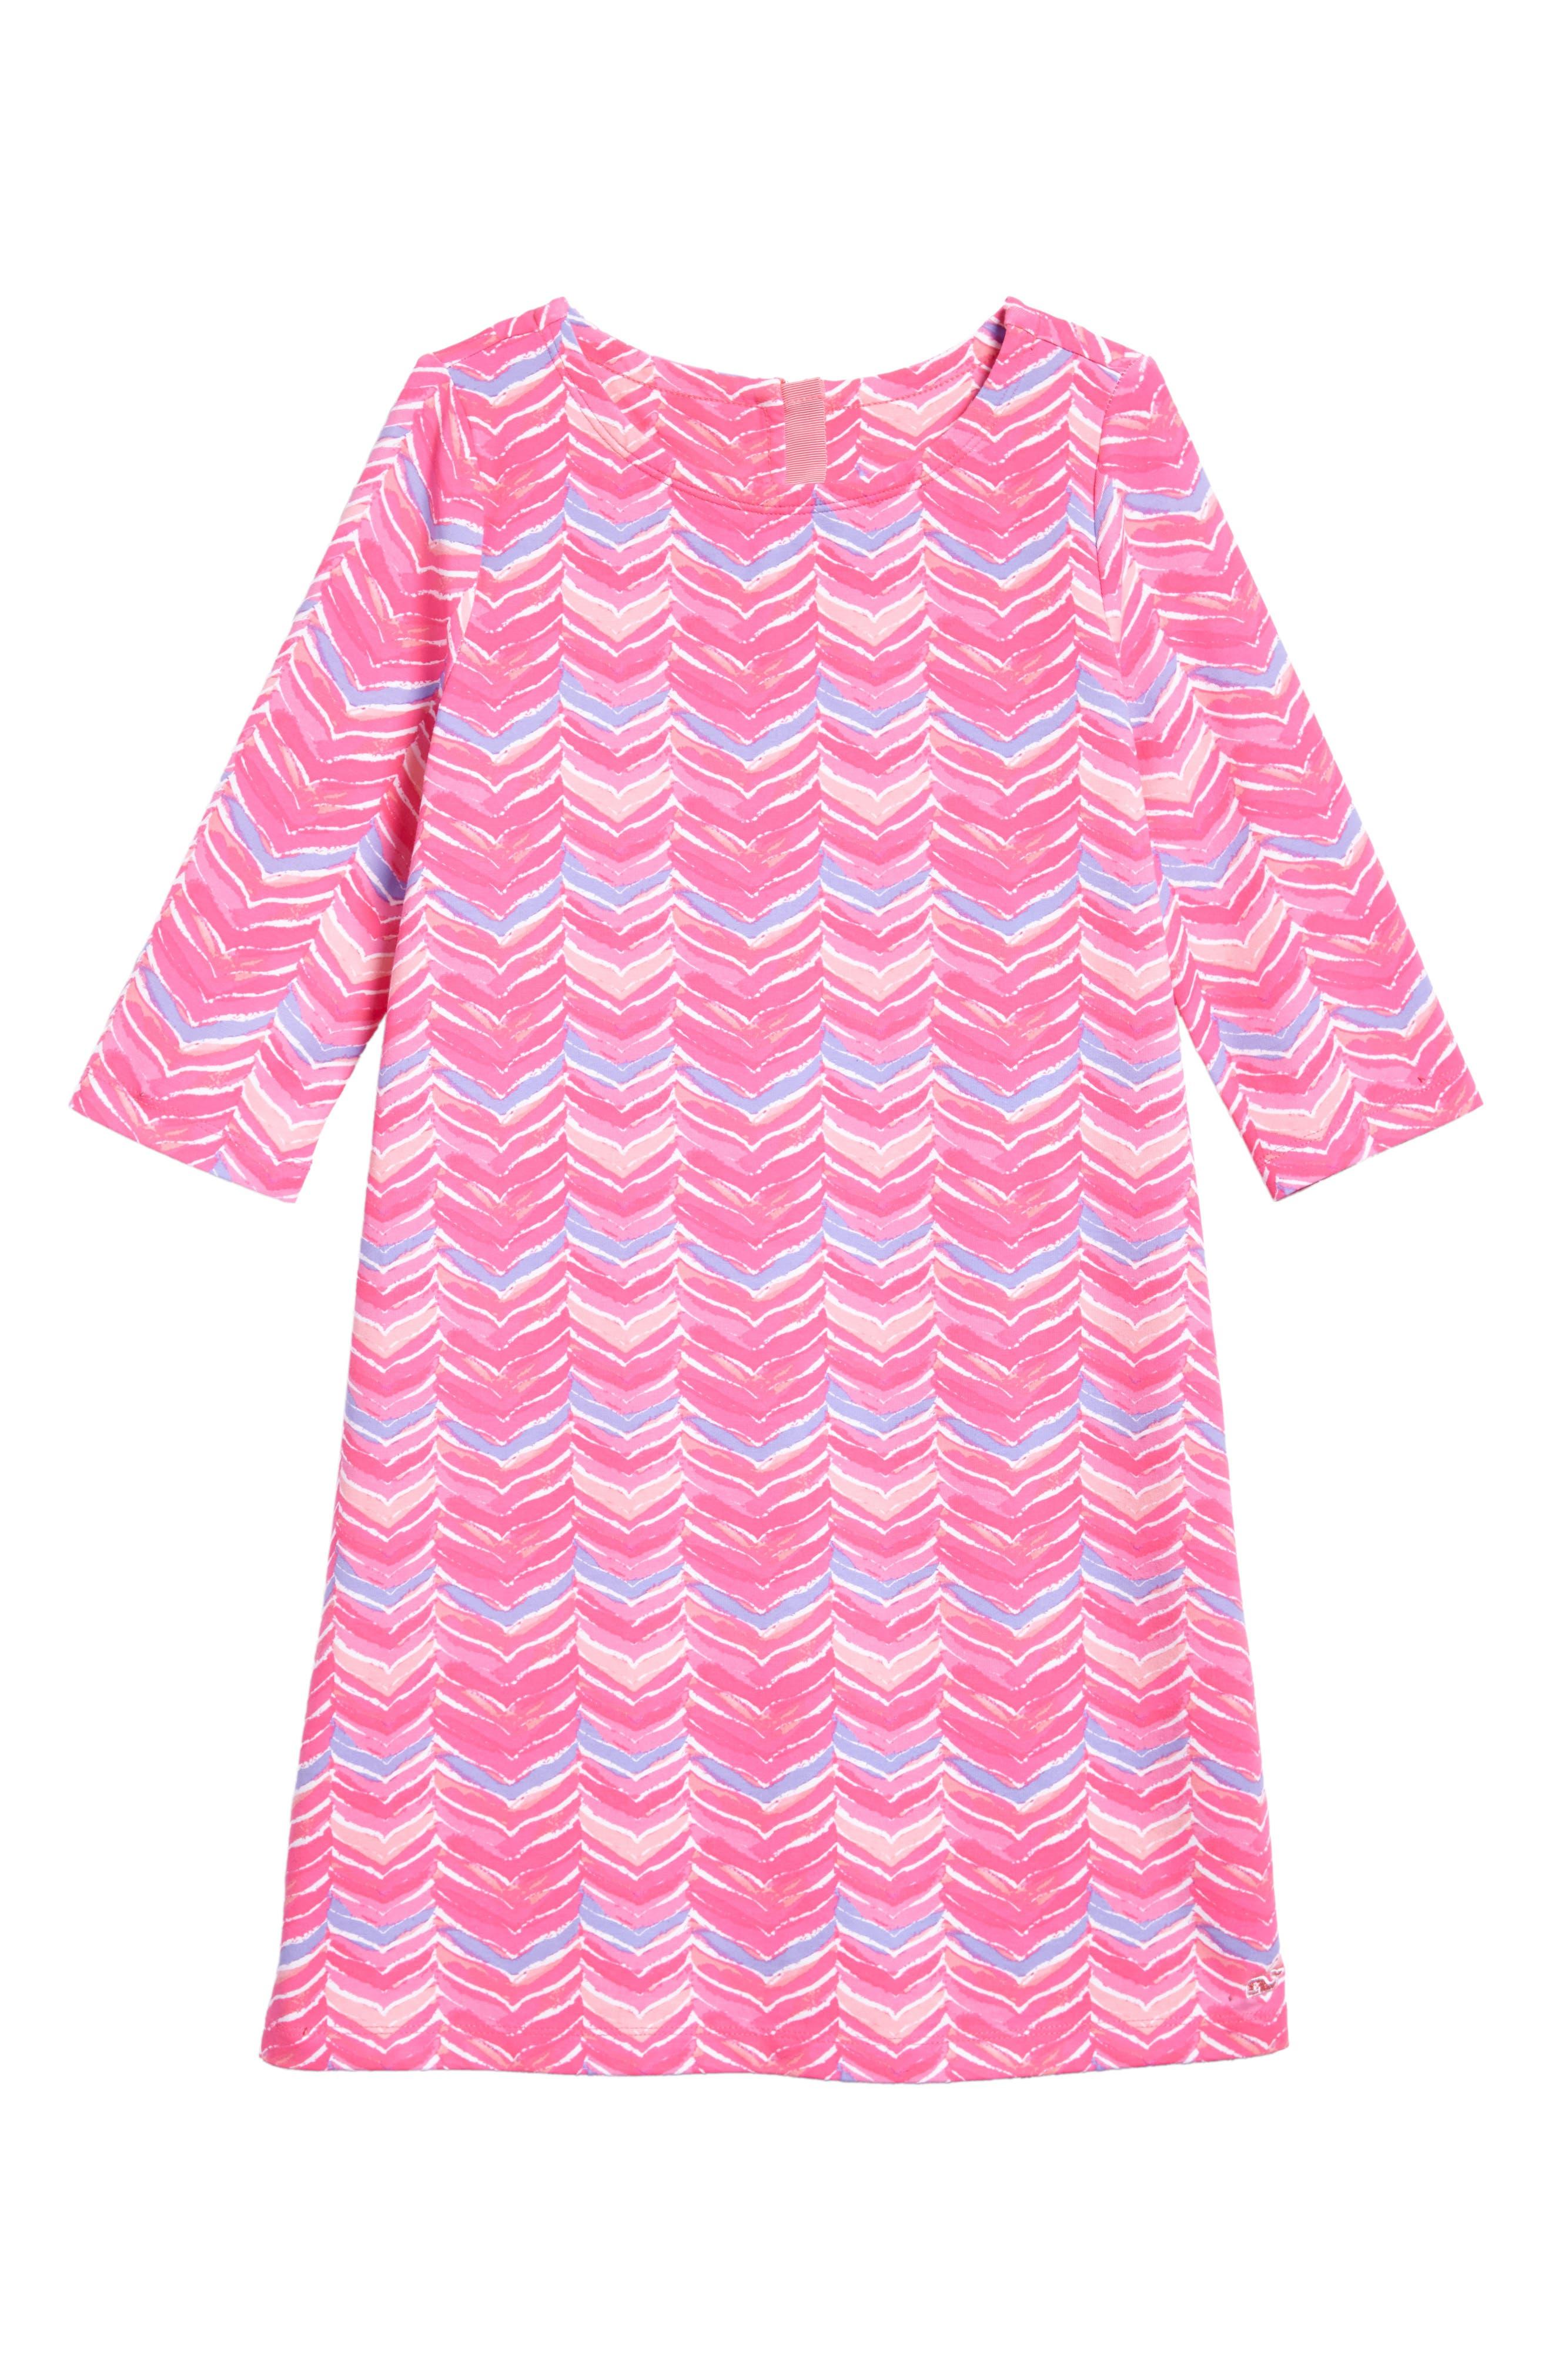 Watercolor Whale Tail Print Dress,                             Main thumbnail 1, color,                             Pink Sherbet